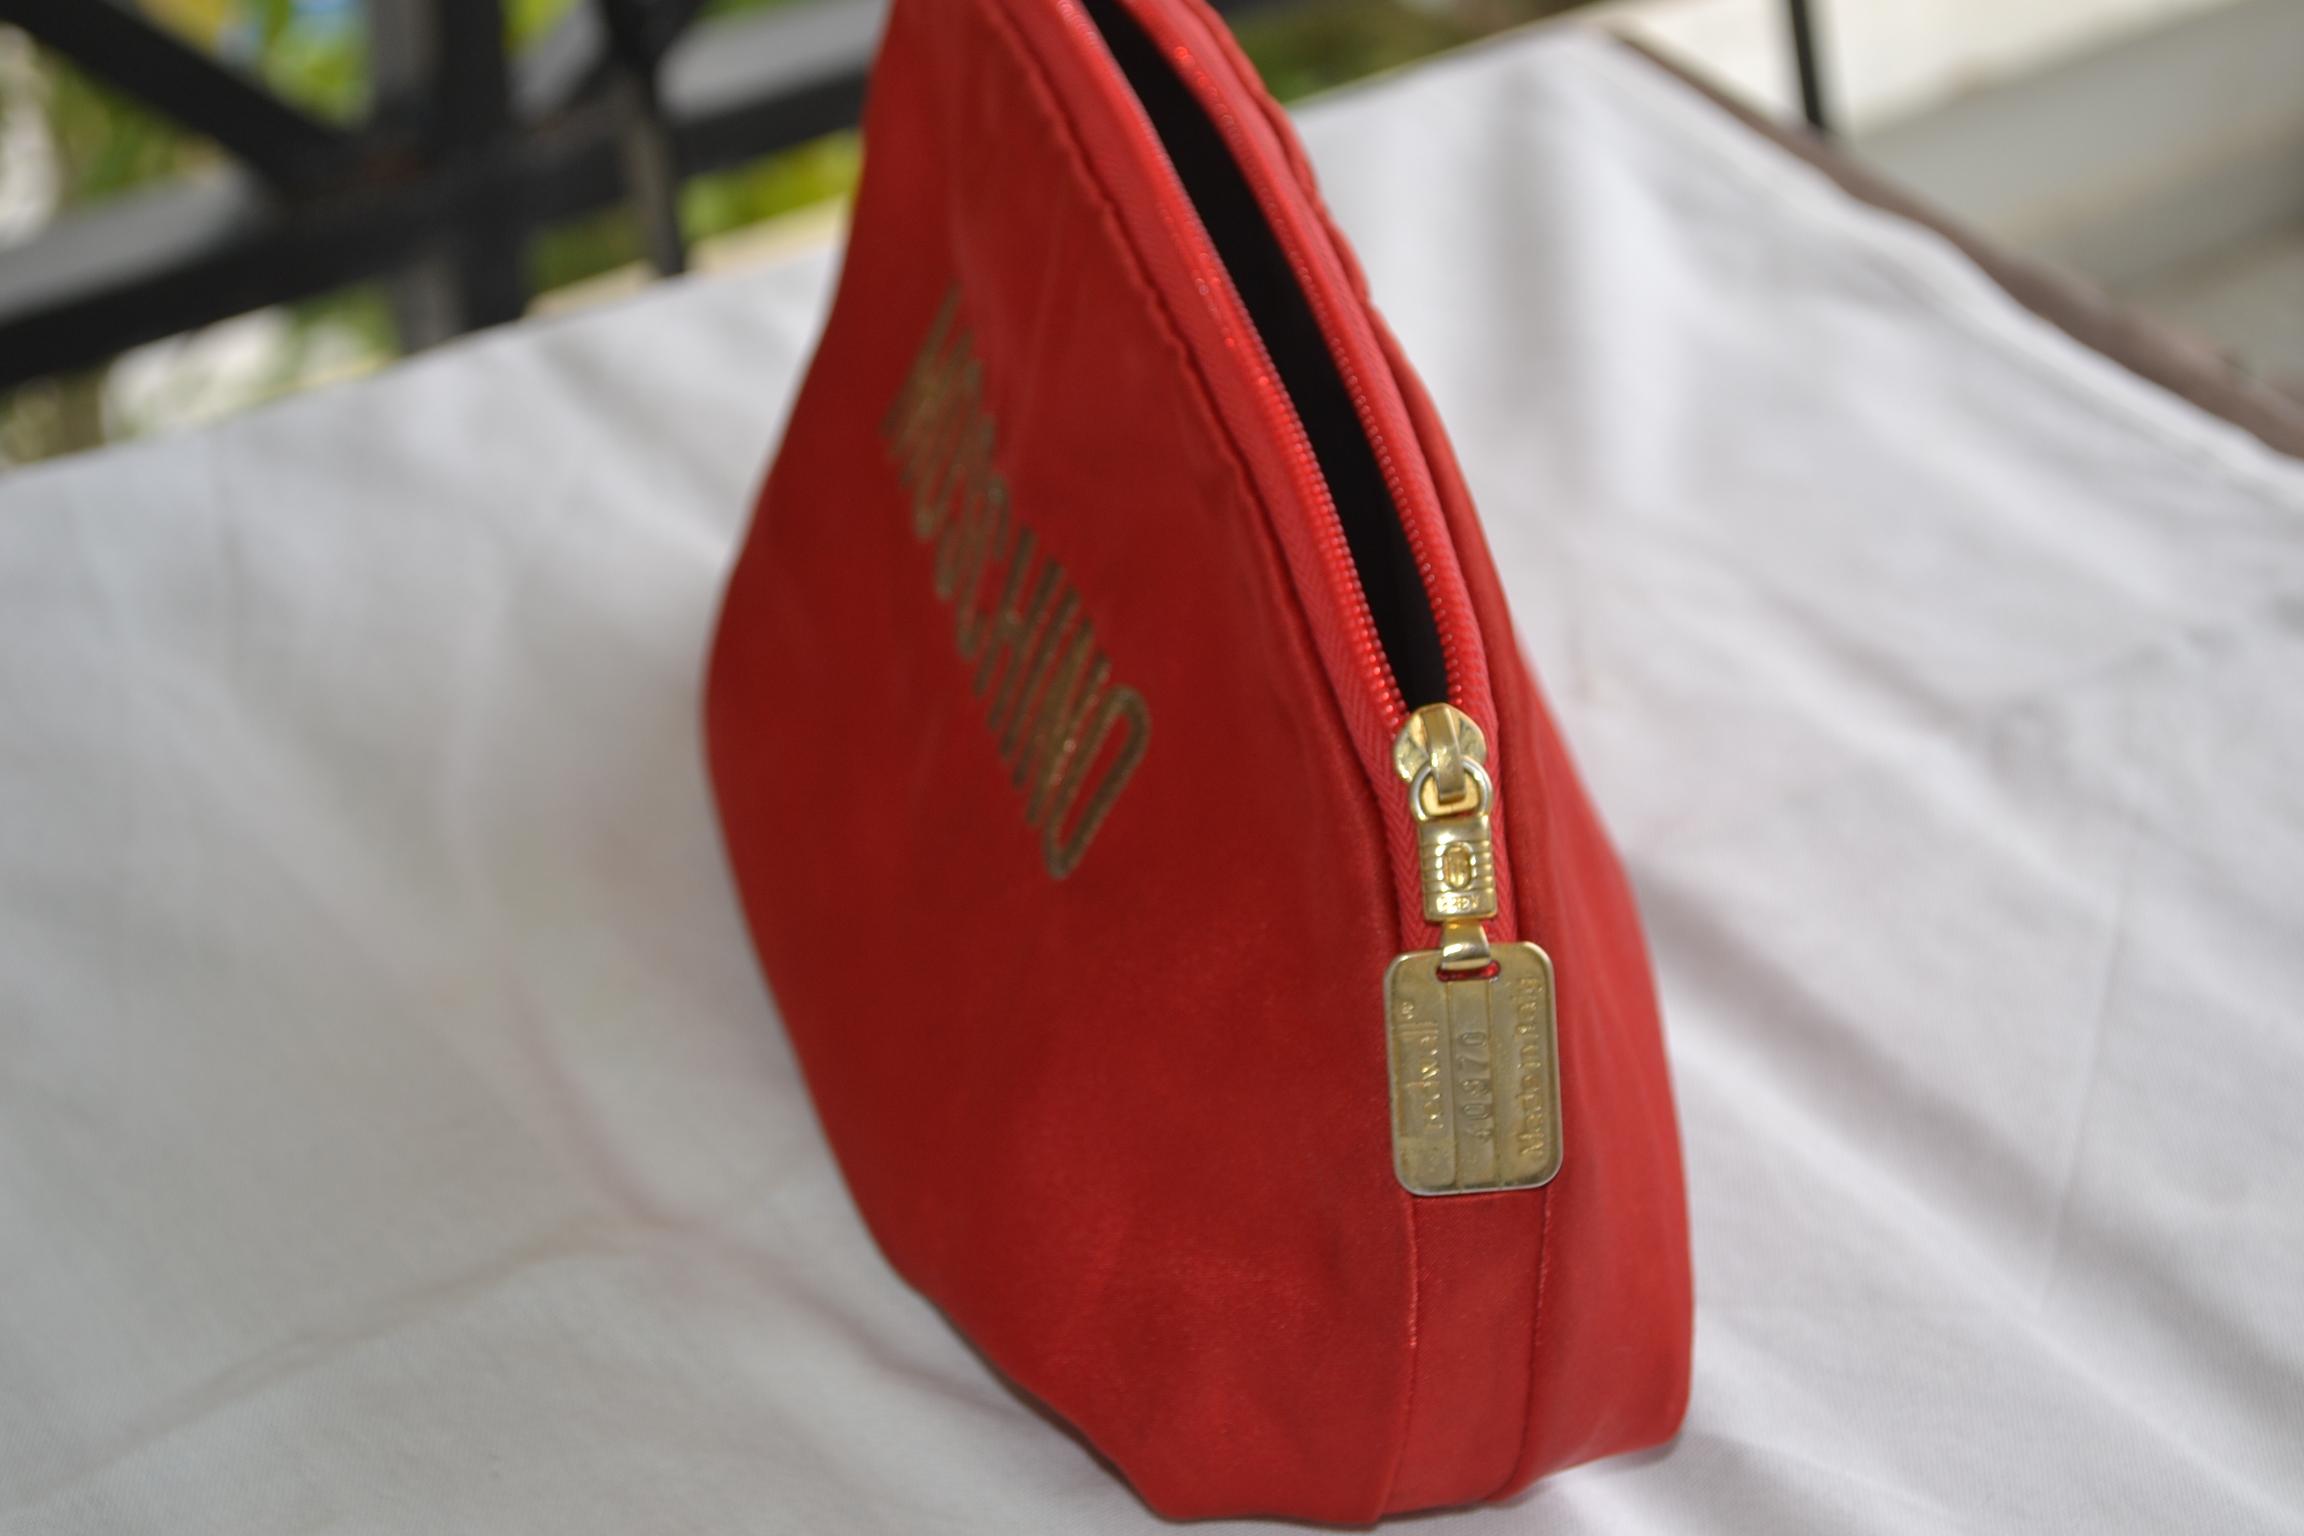 8e0b15c7fb Τσάντα MOSCHINO REDWALL αυθεντική σέ κόκκινο χρώμα σέ προσφορά ...